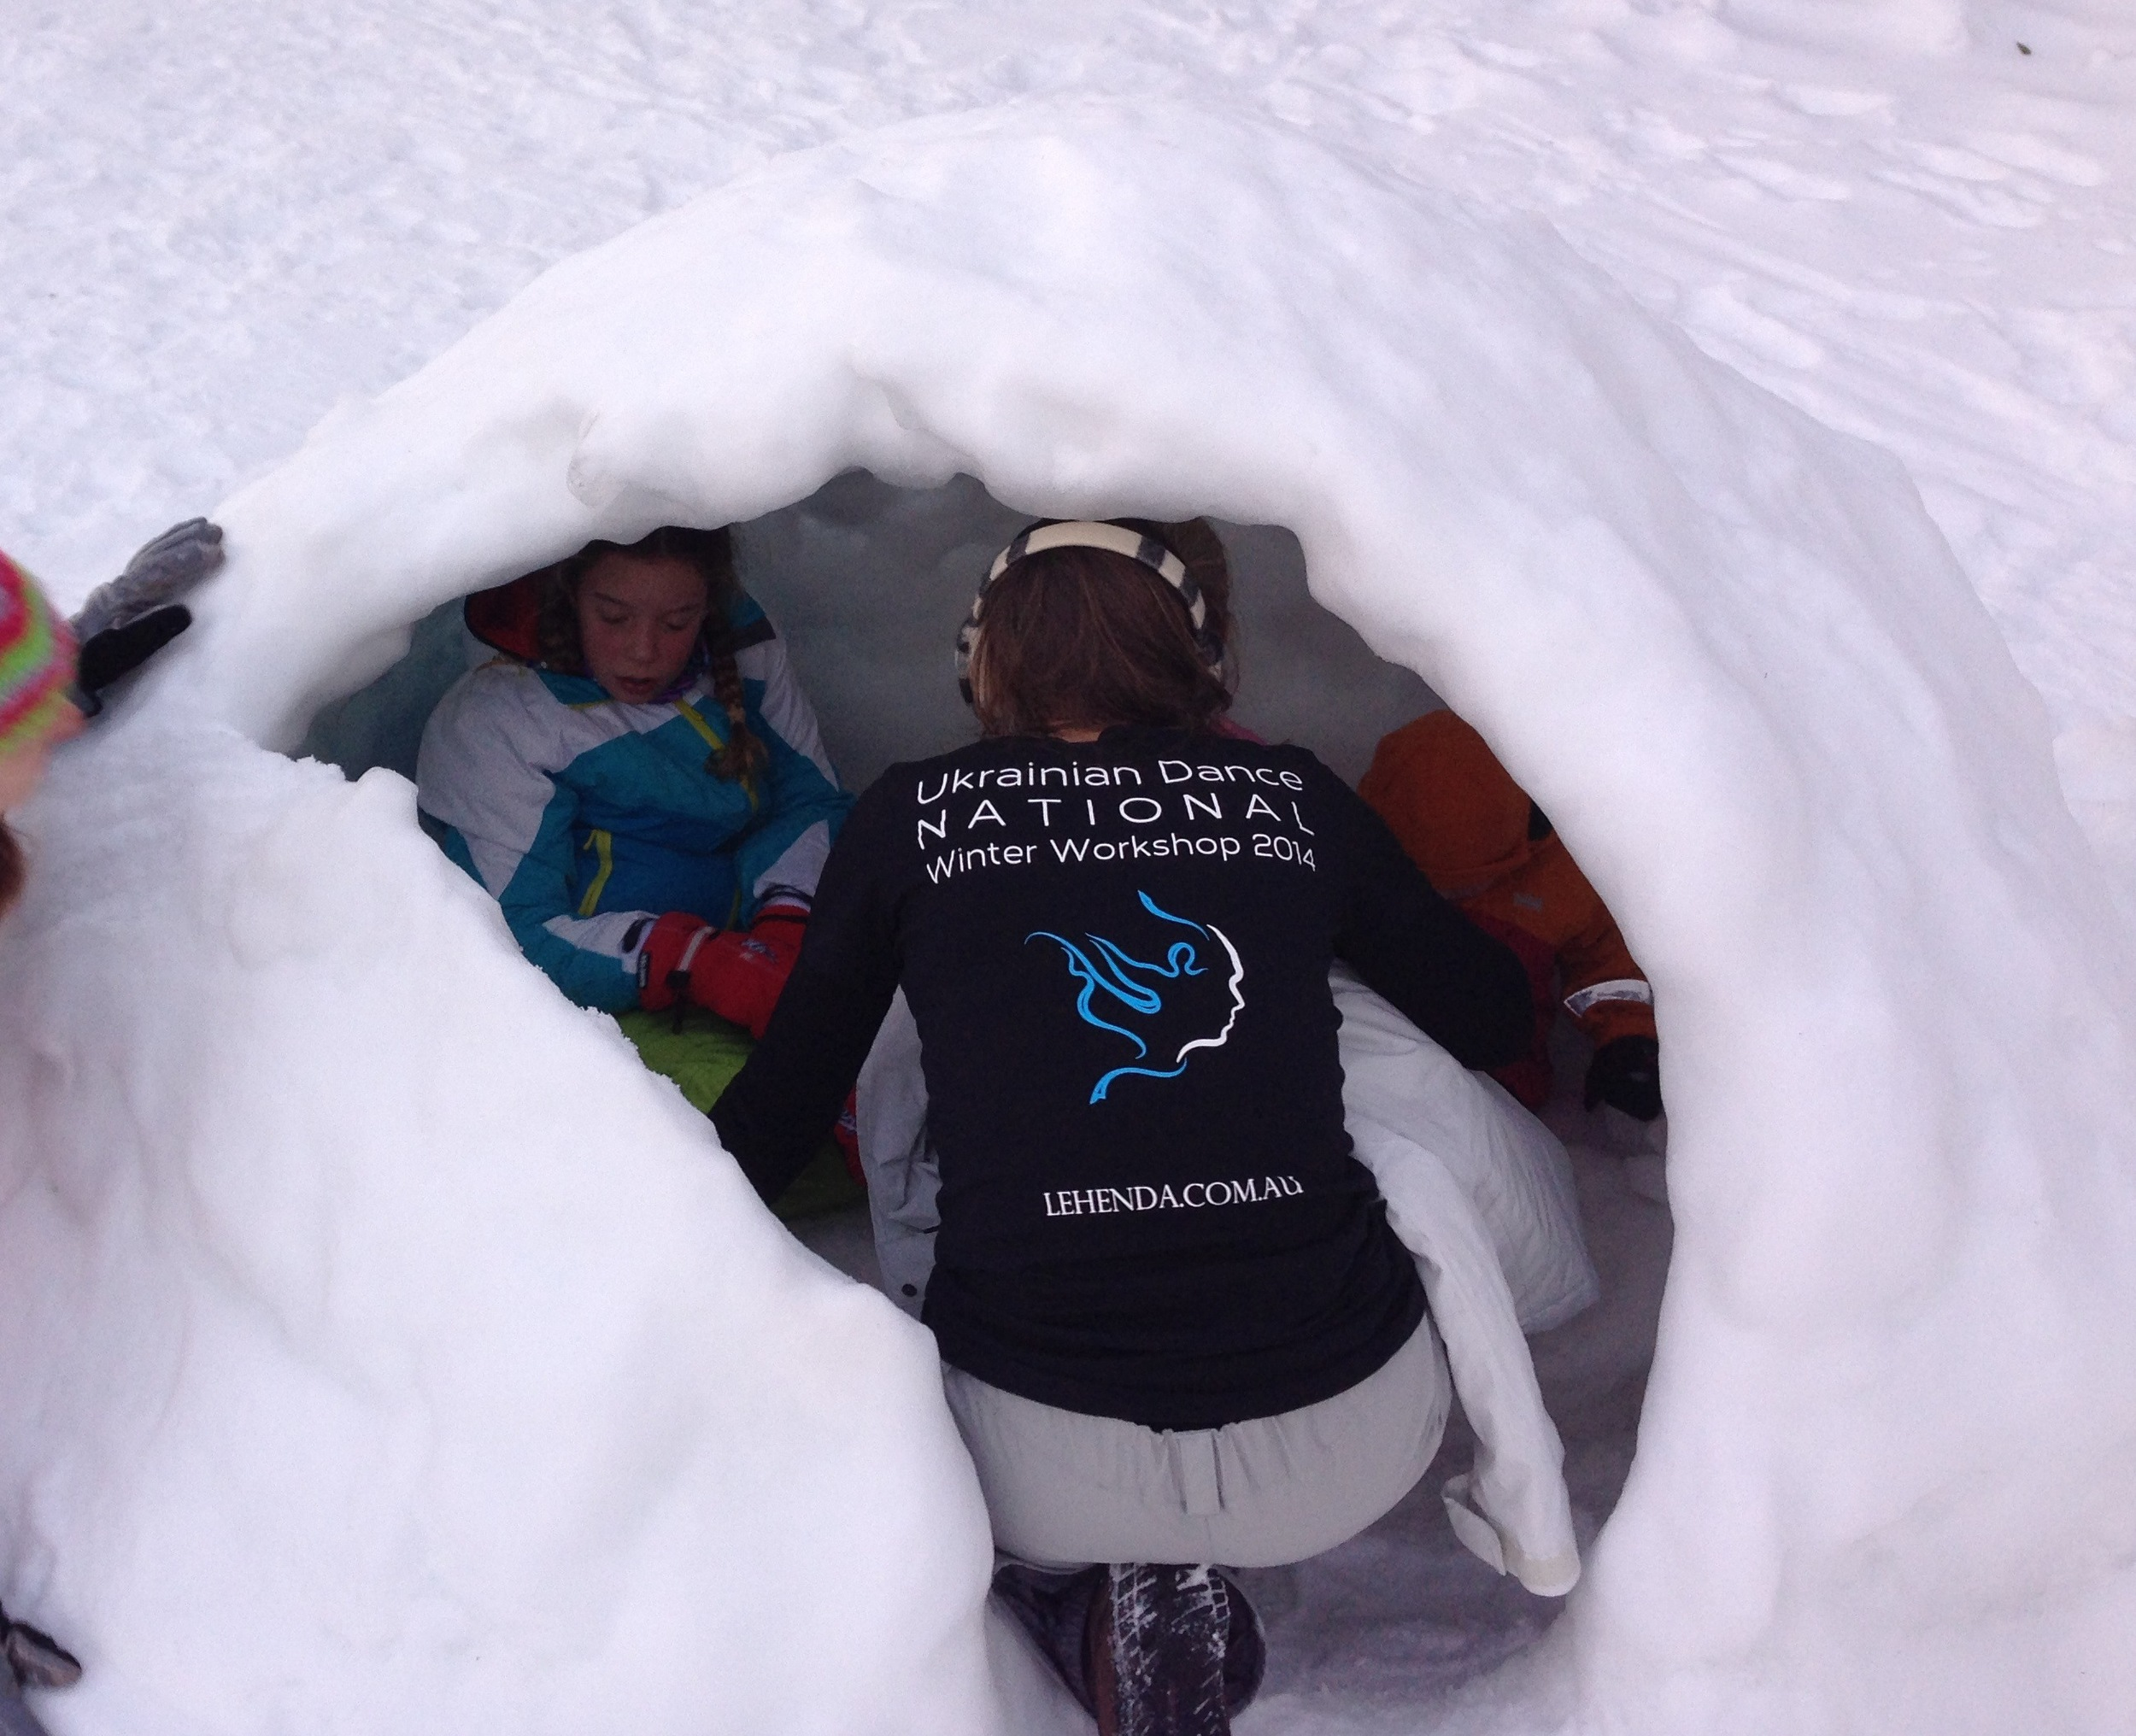 winter workshop dancer in an igloo!